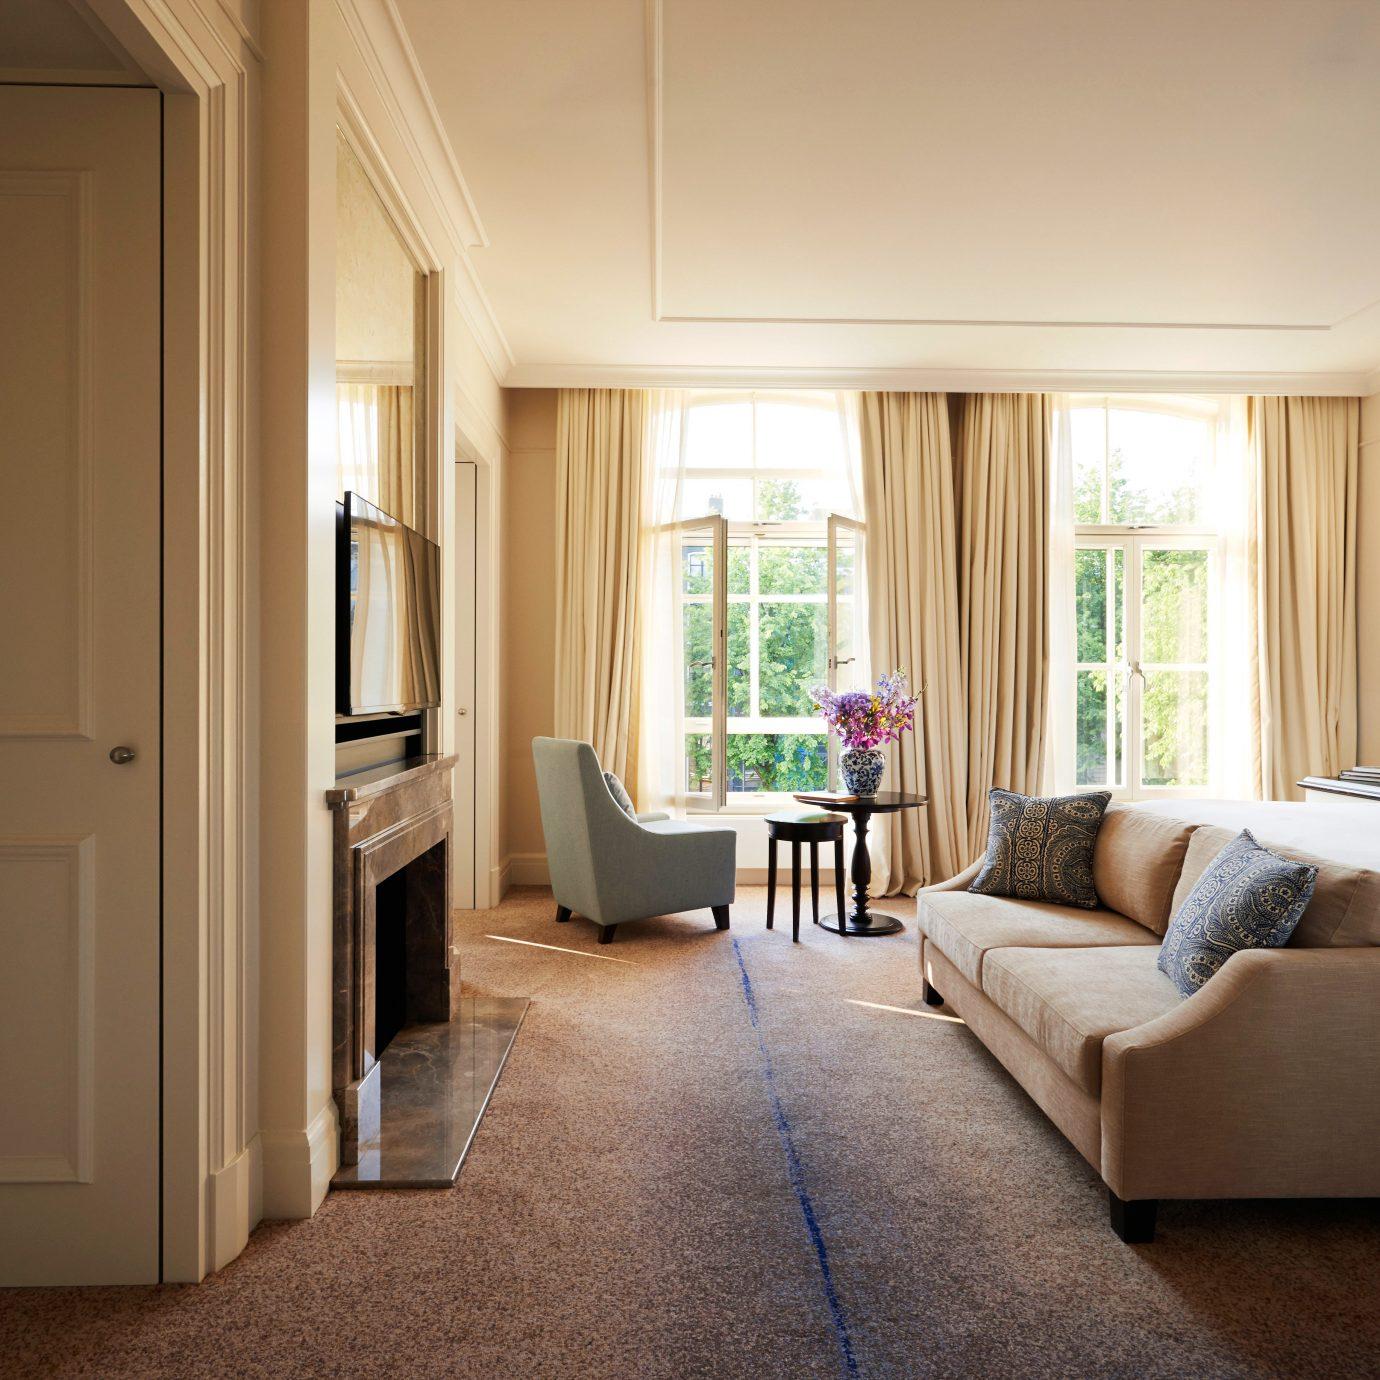 Bedroom City Elegant Family Luxury Romantic Suite property home living room house hardwood cottage